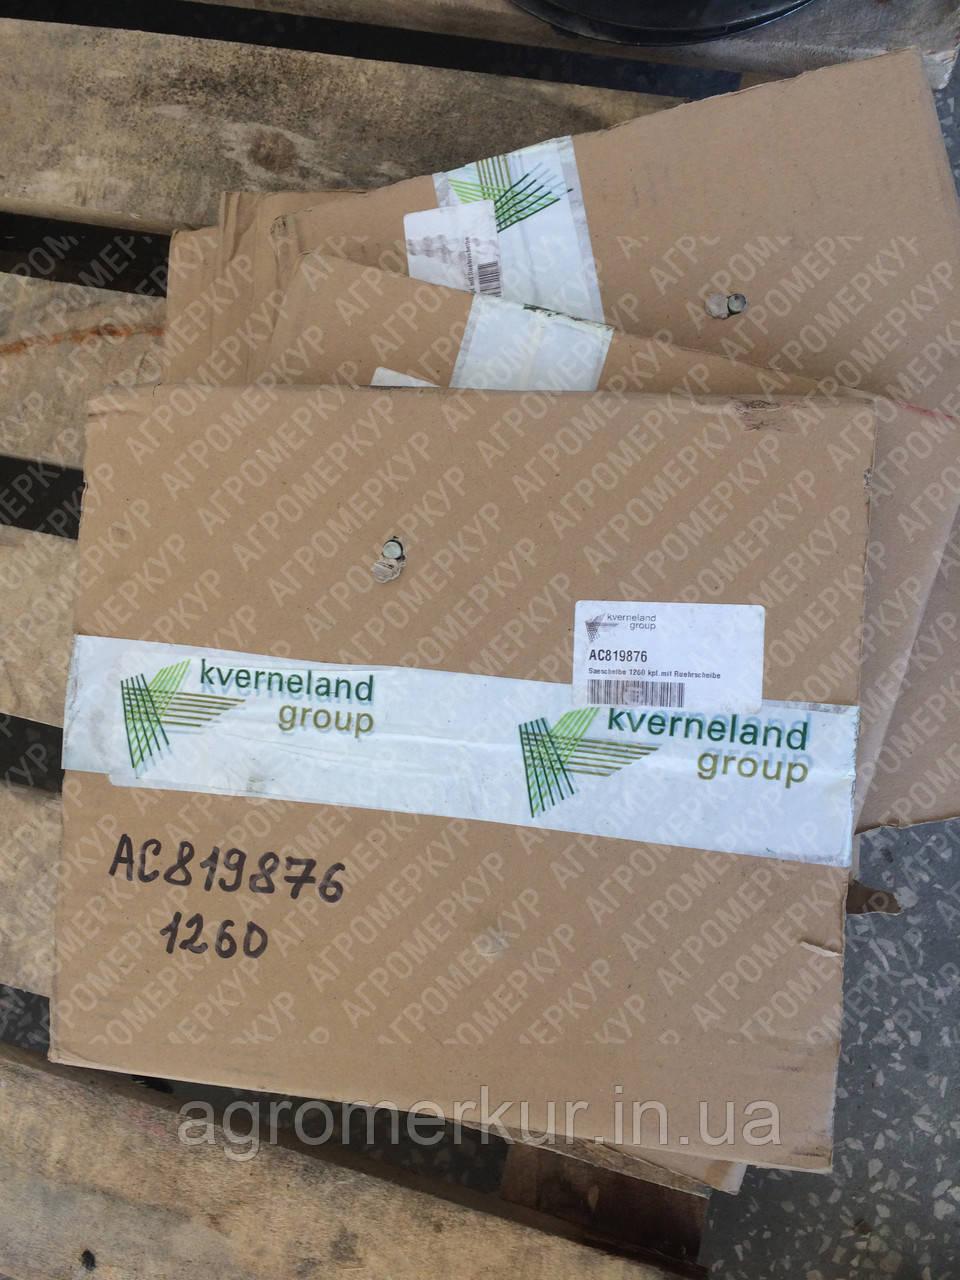 Диск AC819876 1260 CPL. Kverneland